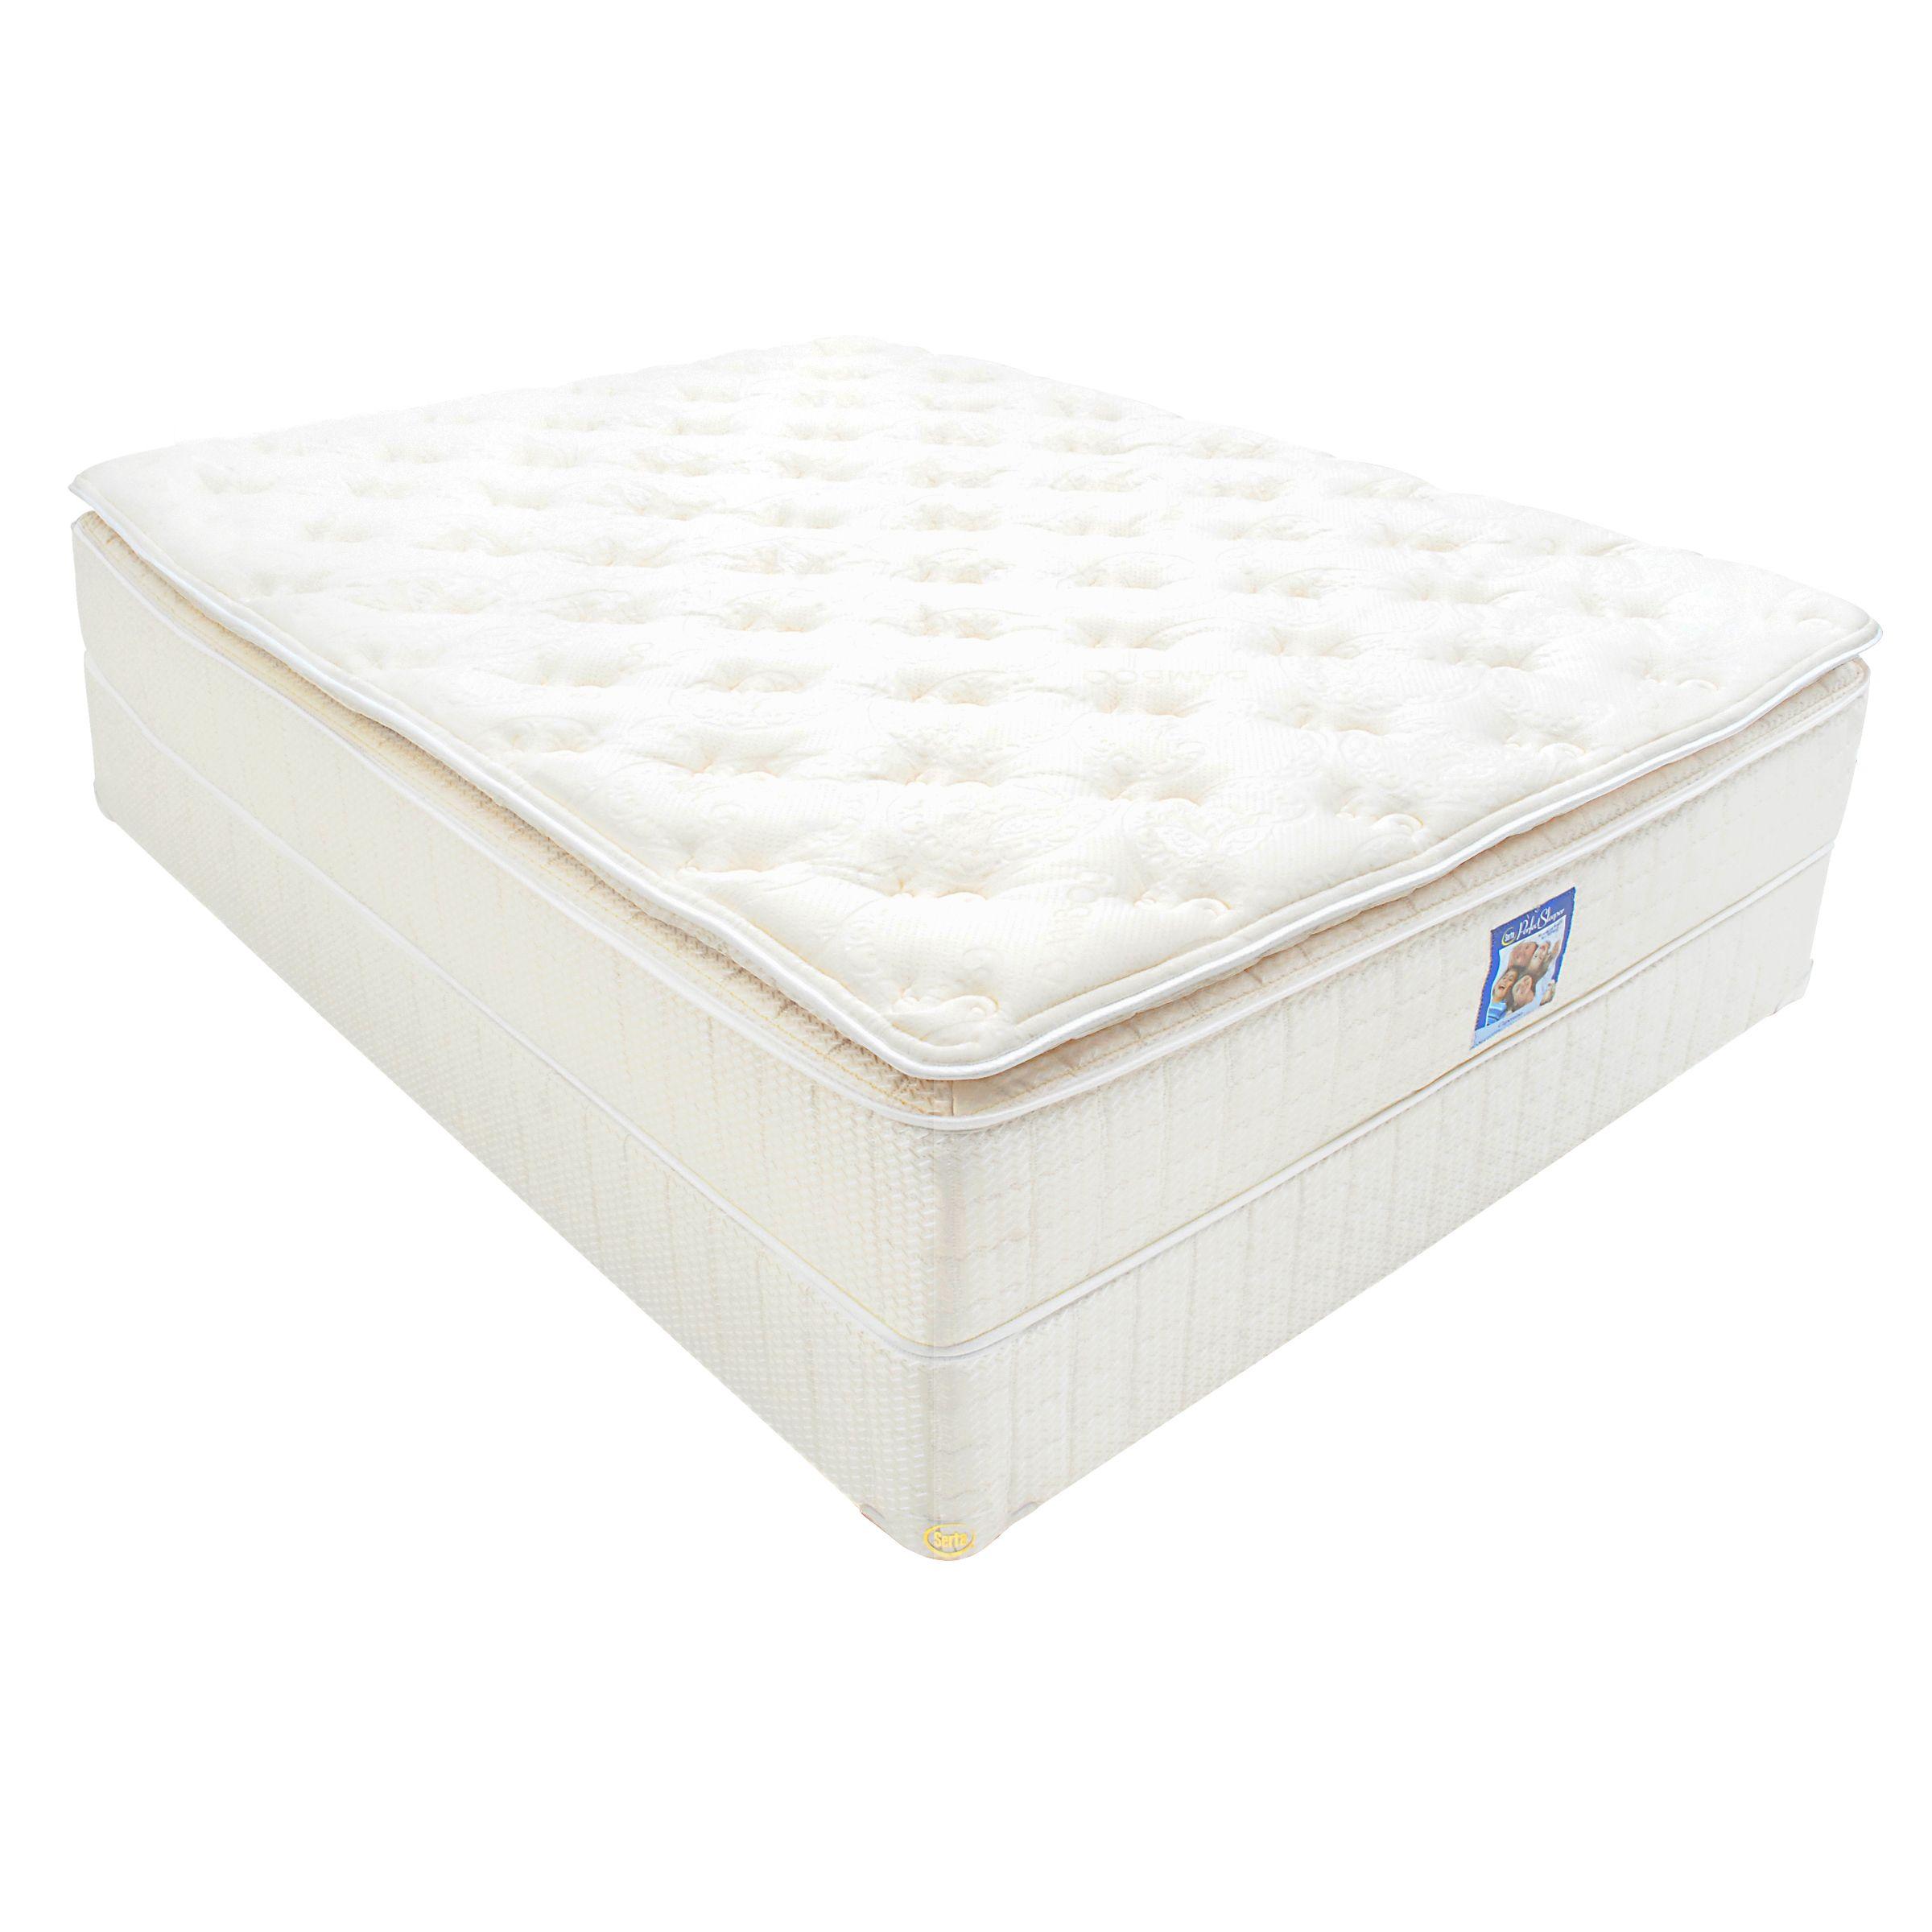 Serta  95129  Perfect Sleeper Cupertino Select Pillow